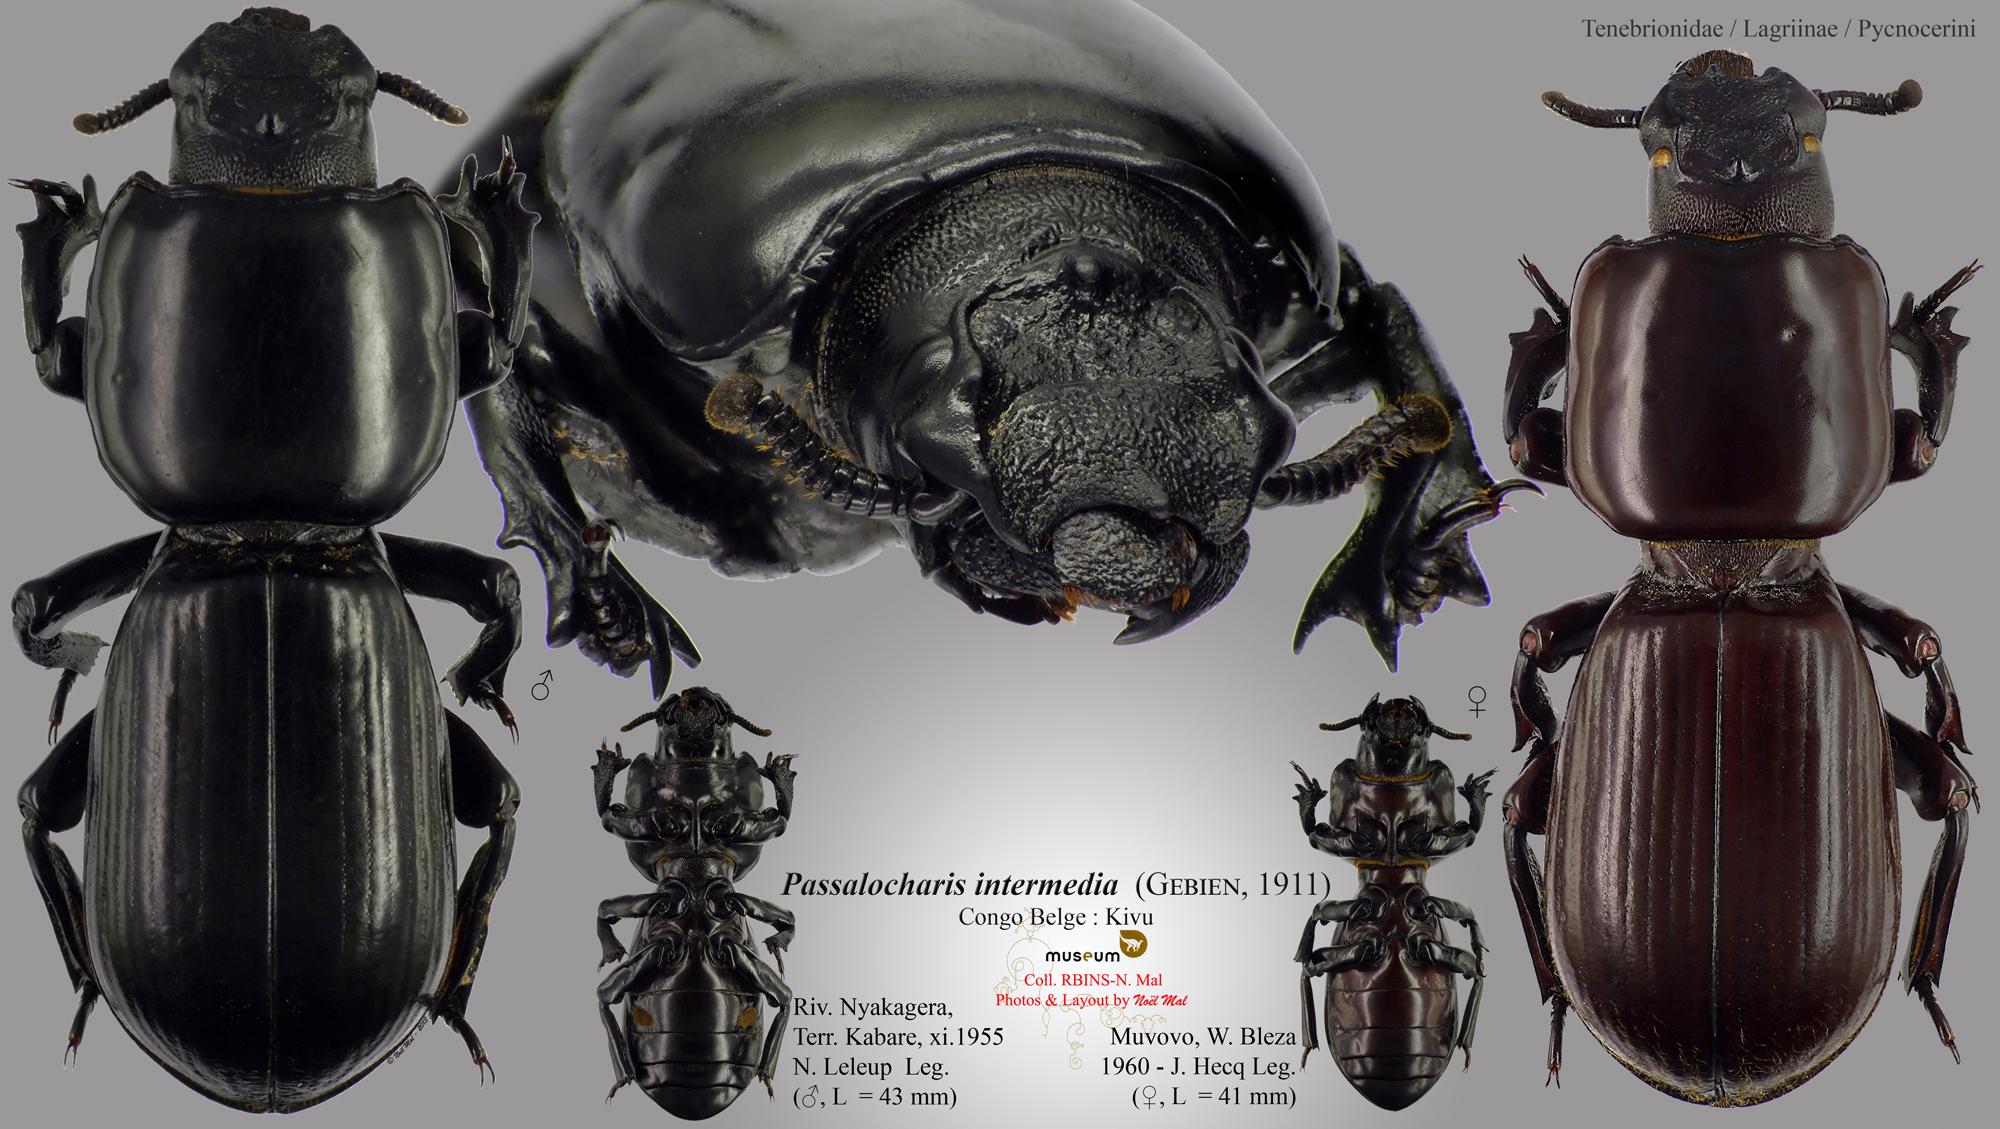 Passalocharis intermedia.jpg